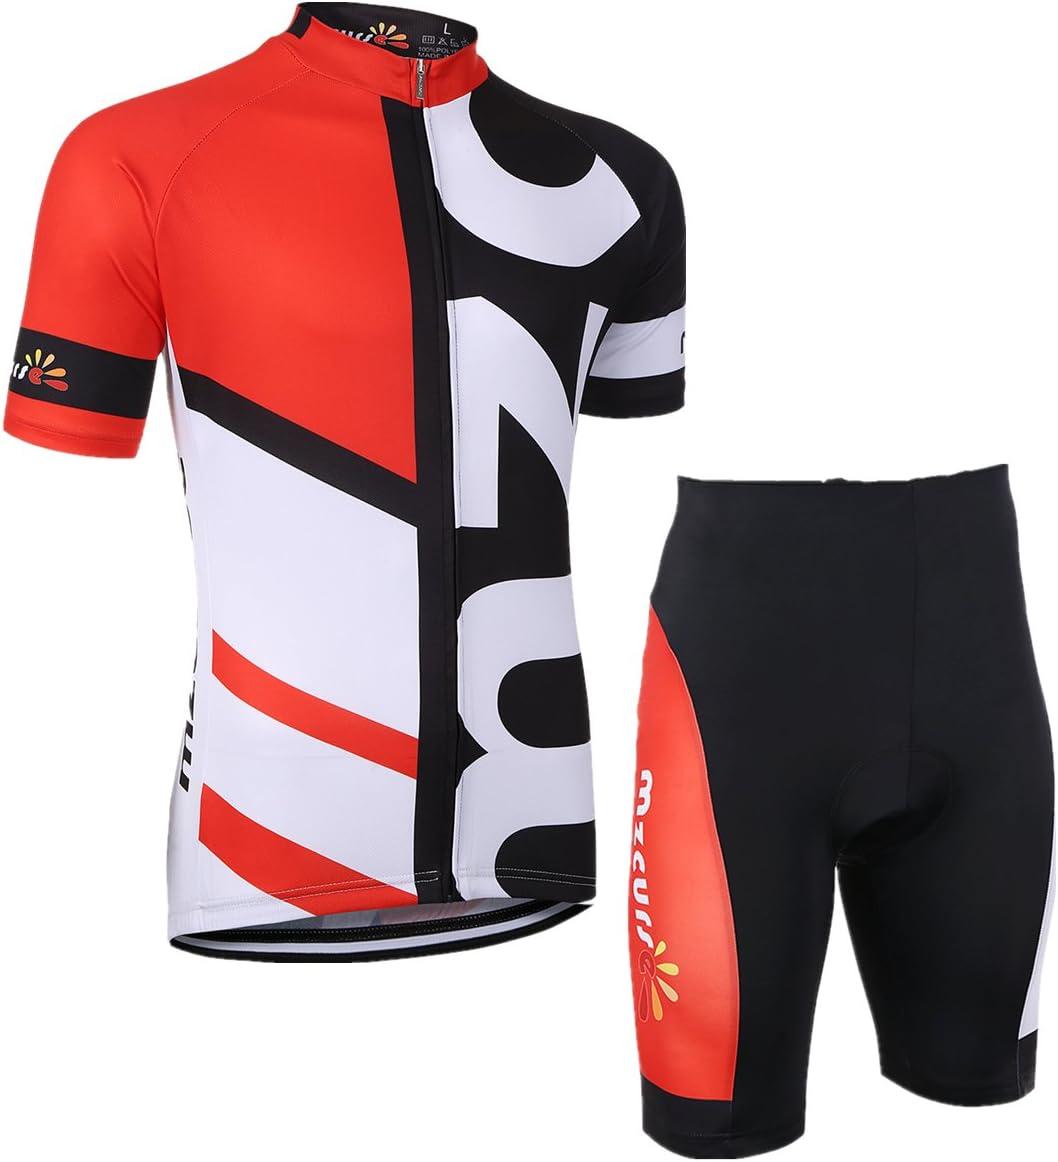 MzcurseメンズアウトドアPro Team Short Sleeve Cycling Jersey Shorts Set